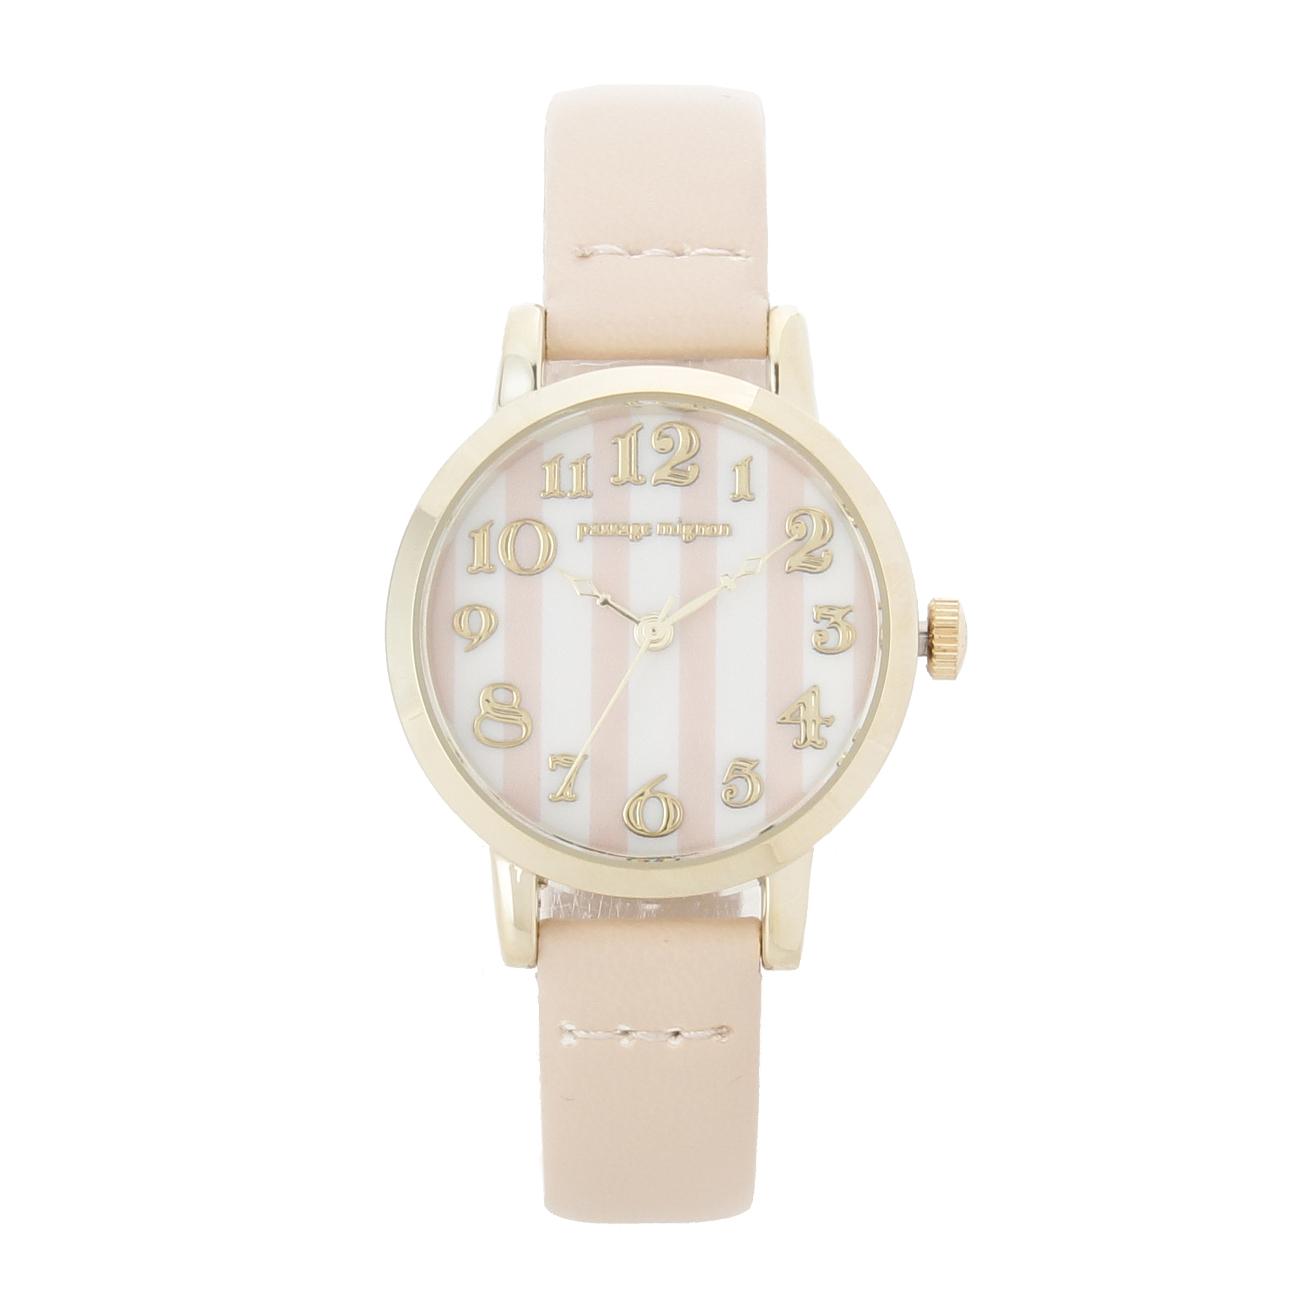 【passage mignon (パサージュ ミニョン)】ストライプ腕時計レディース 雑貨|腕時計 ライトベージュ